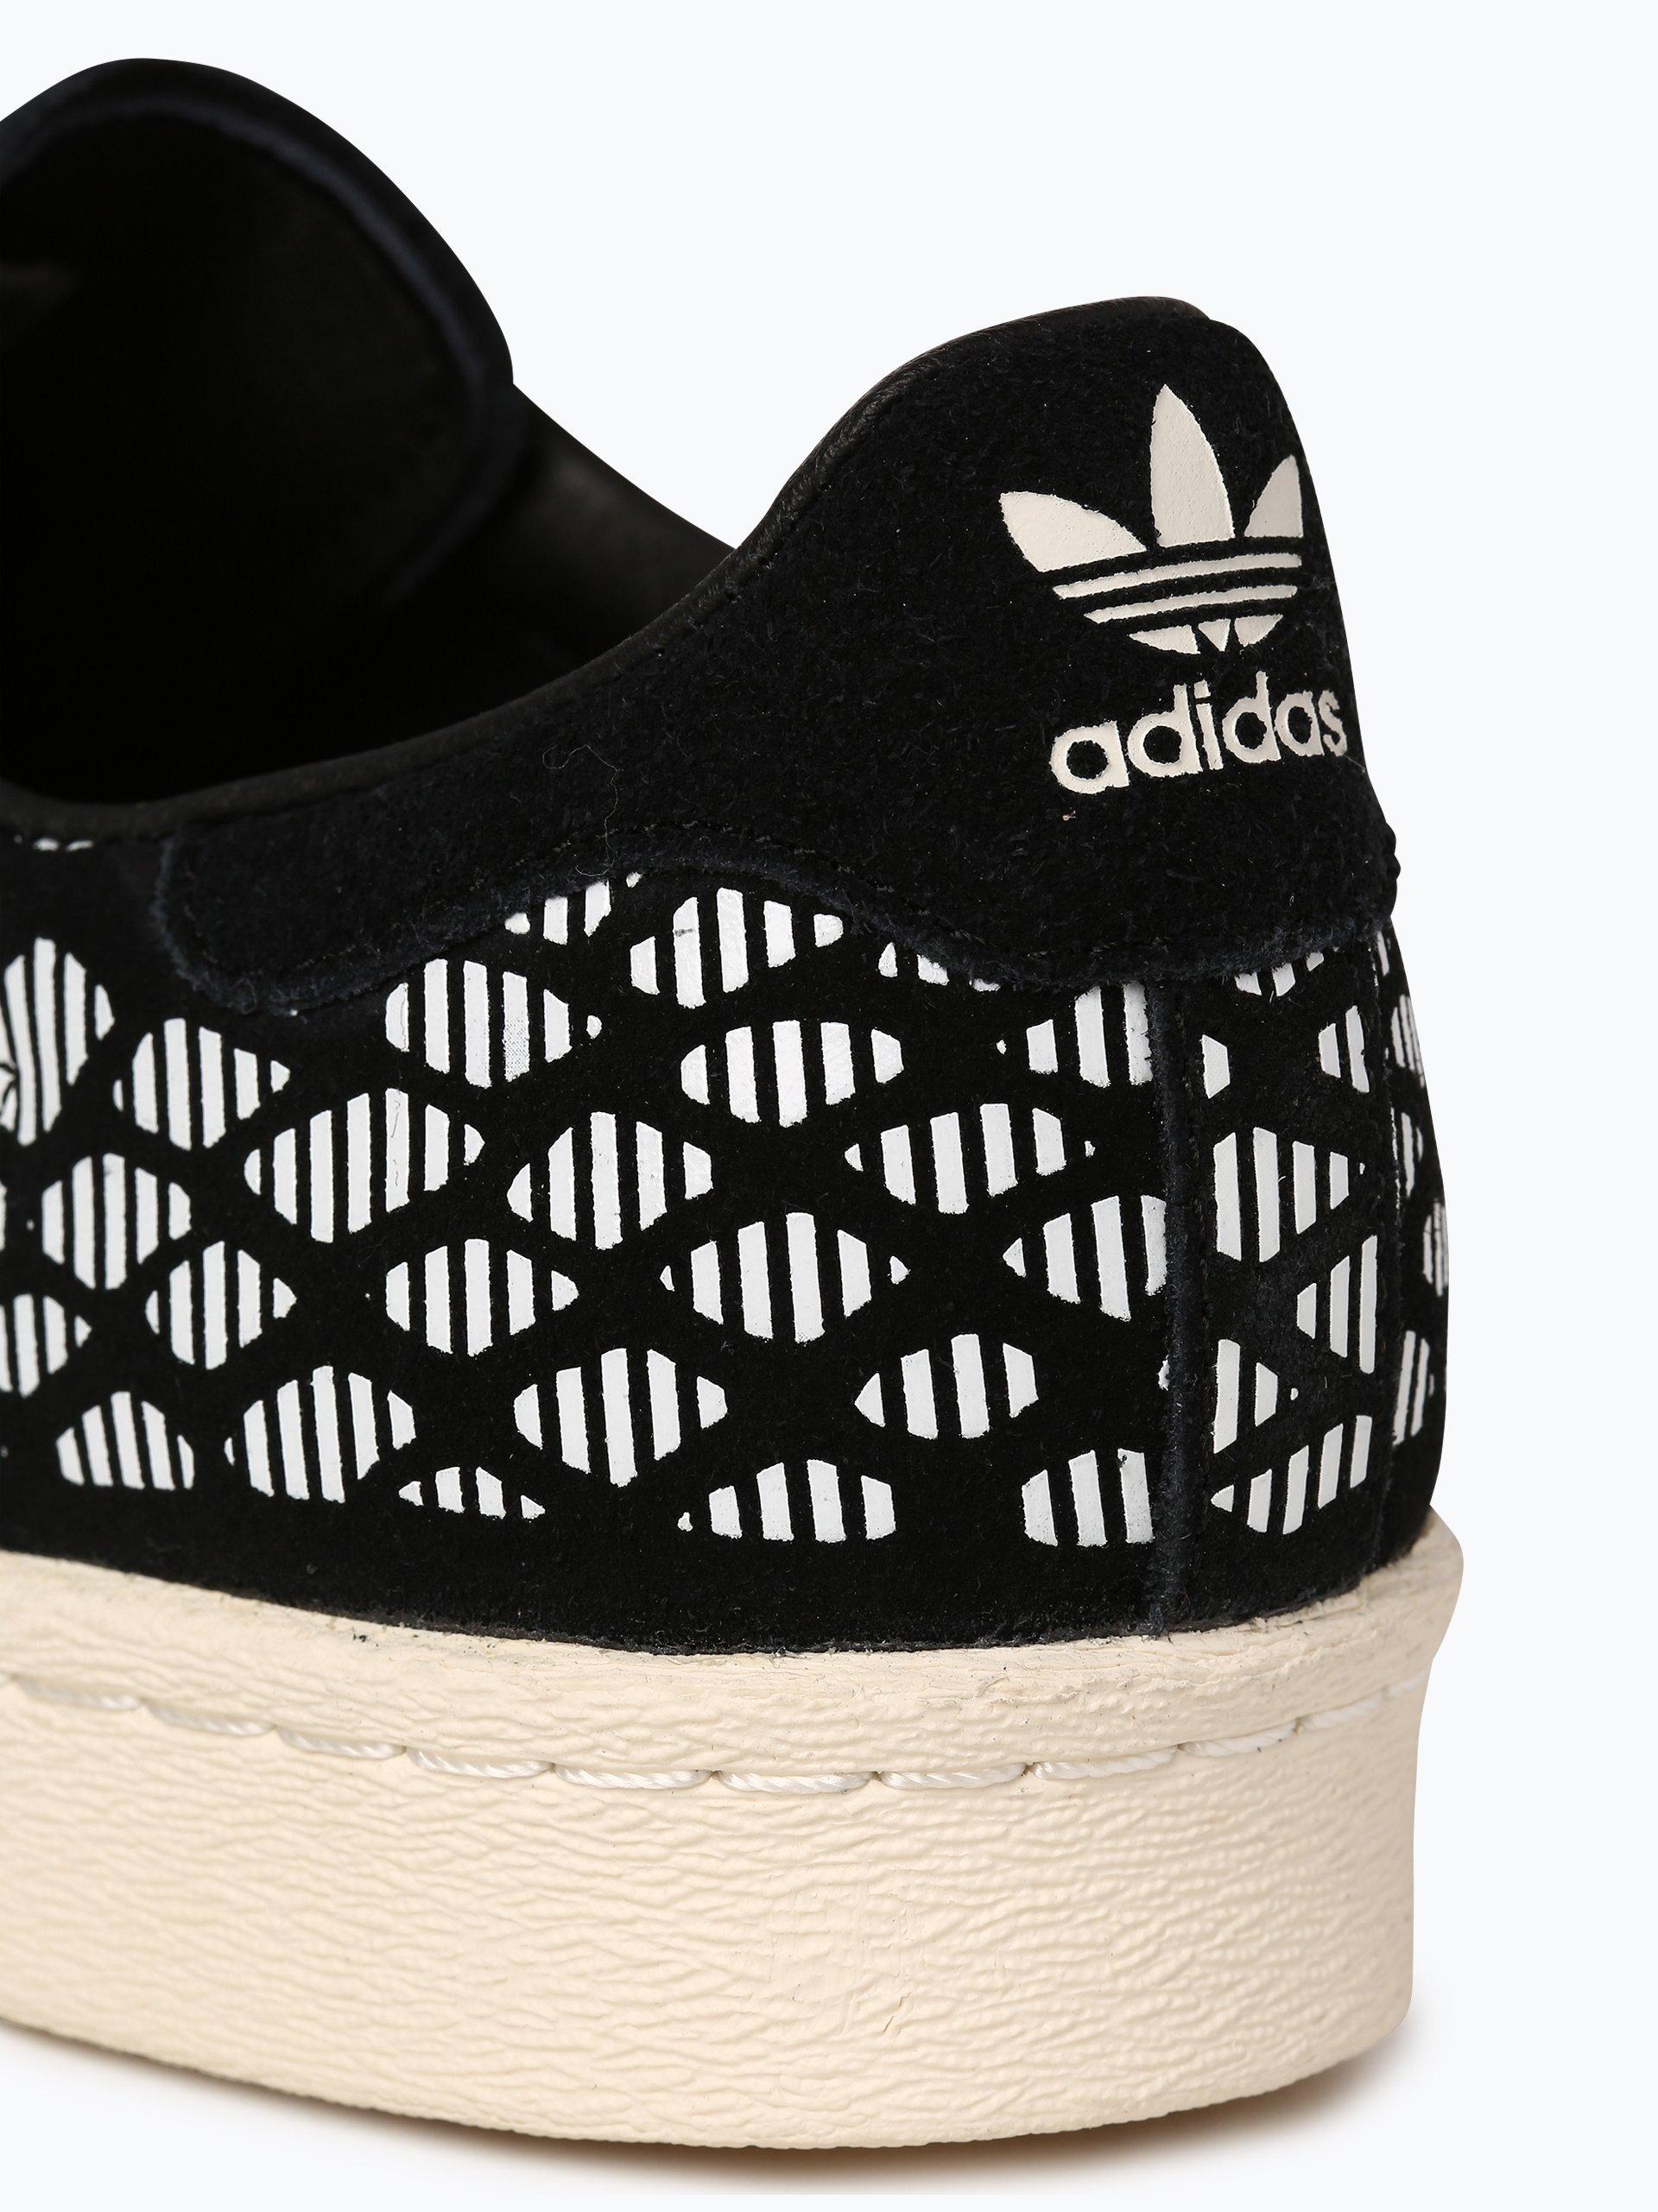 adidas Originals Tenisówki damskie z dodatkiem skóry – Superstar 80s